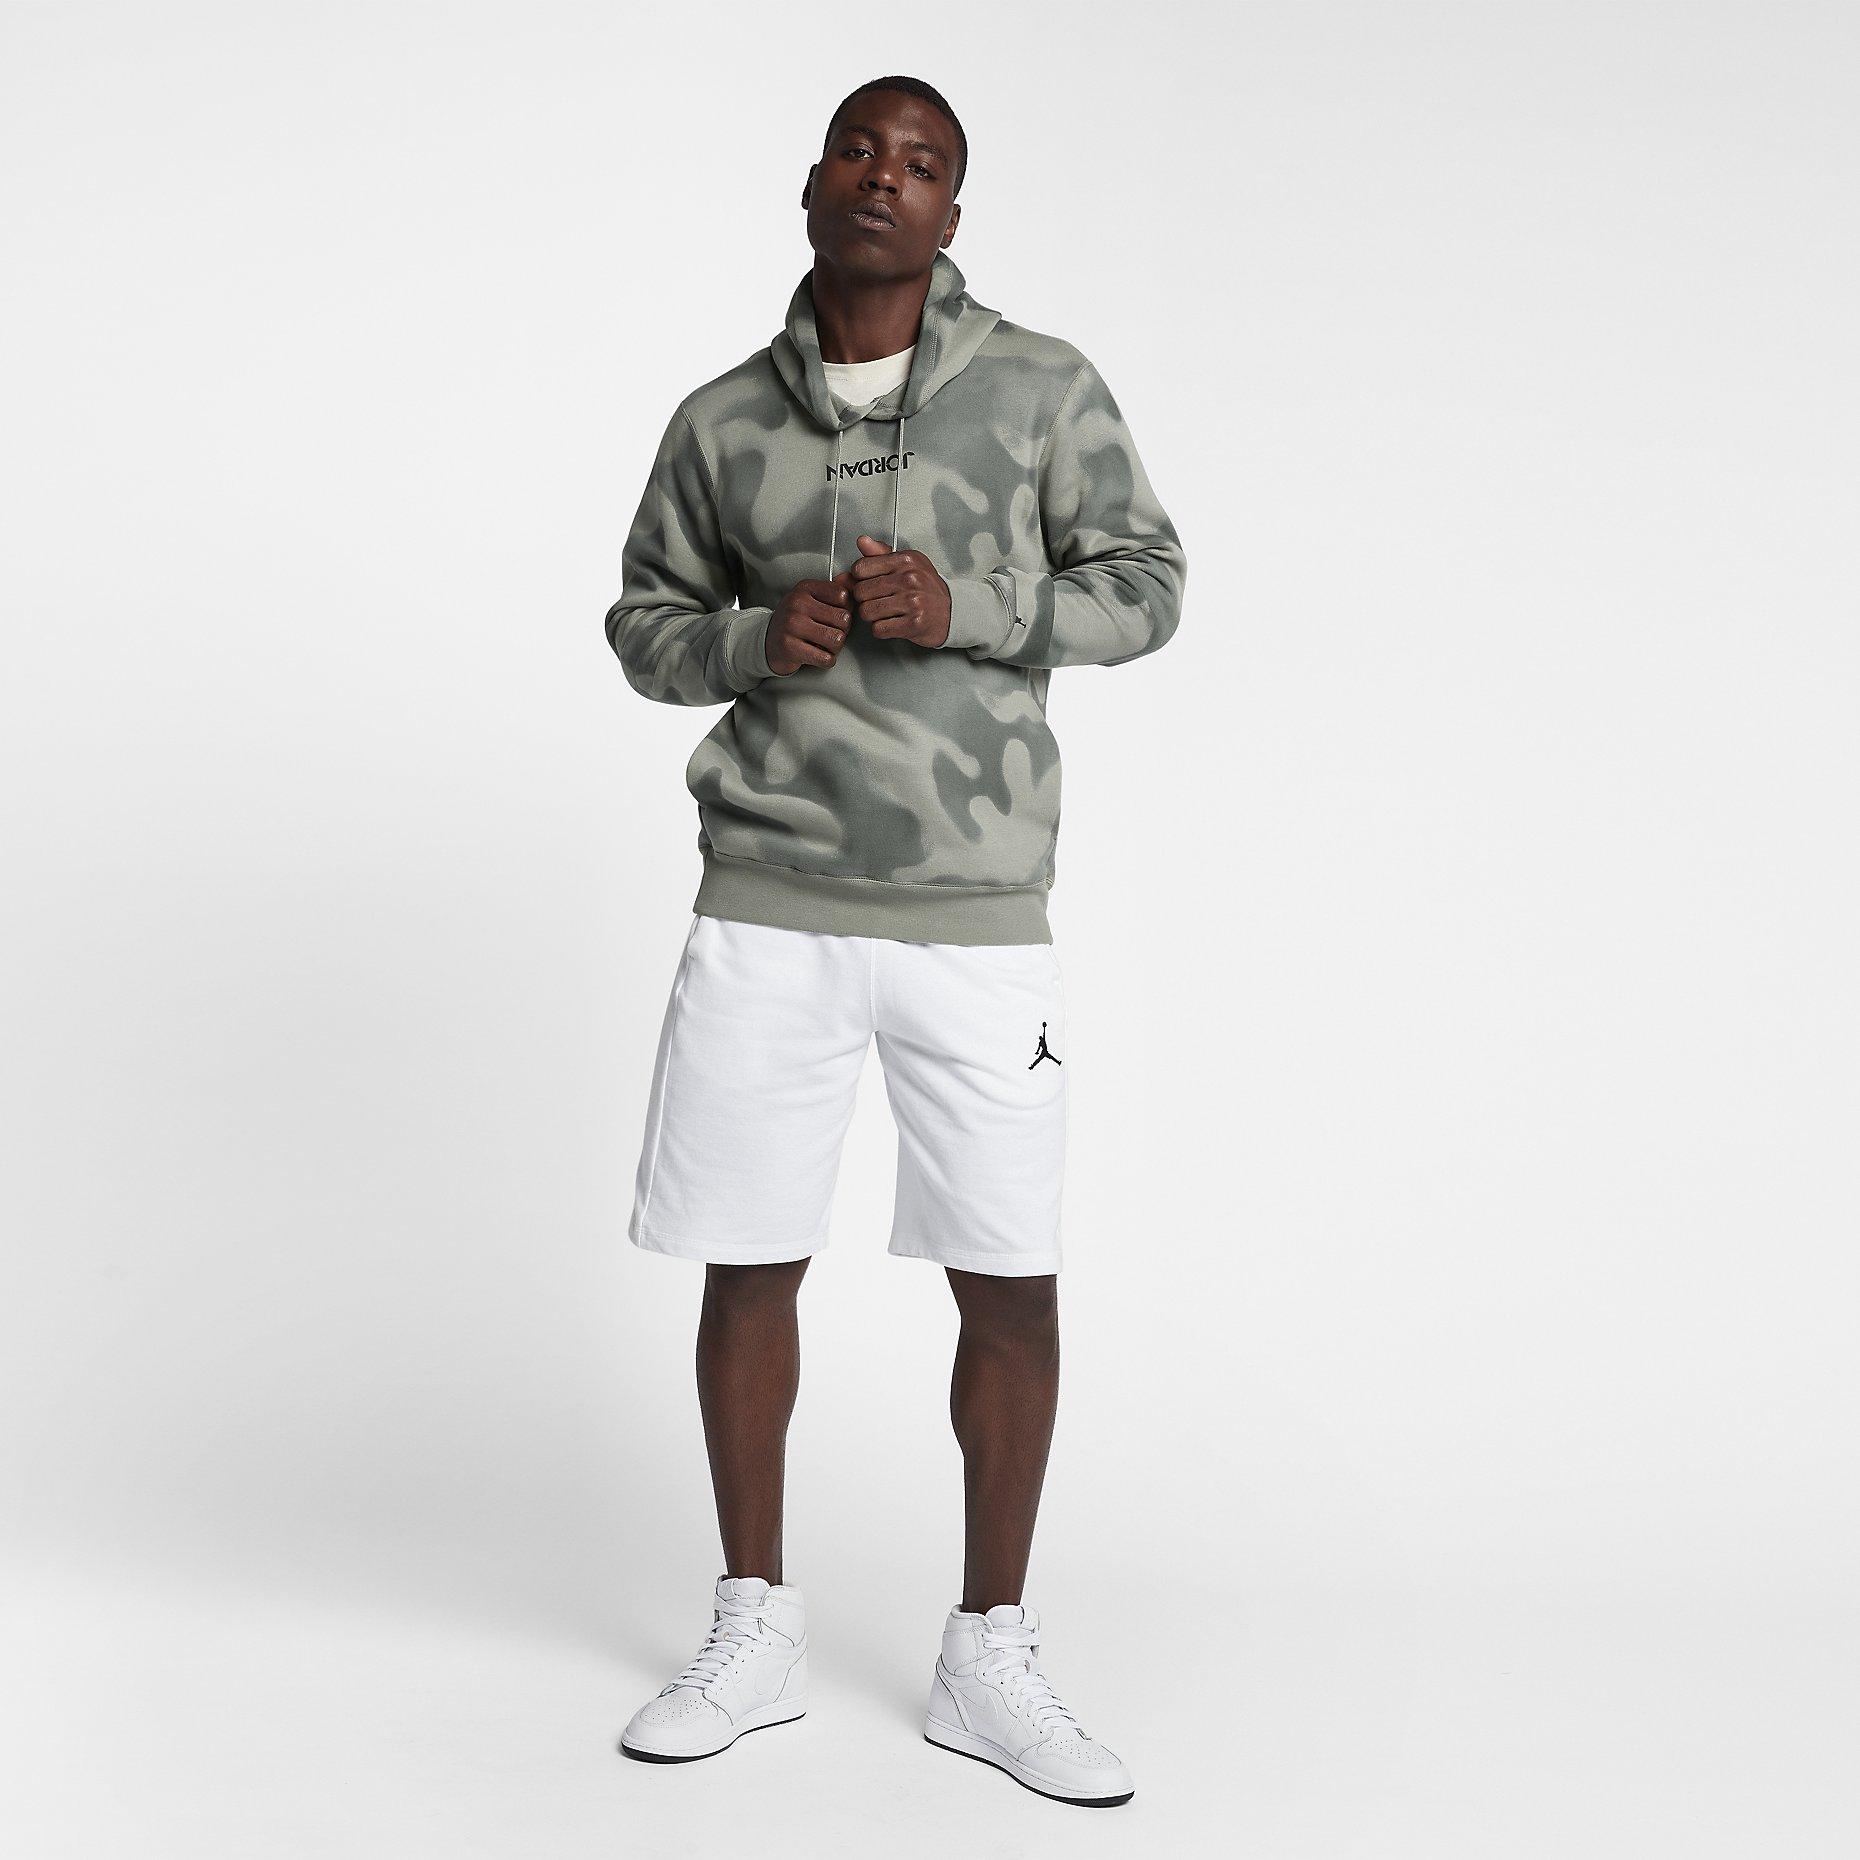 jordan-sportswear-p51-flight-mens-fleece-pullover-hoodie (4).jpg